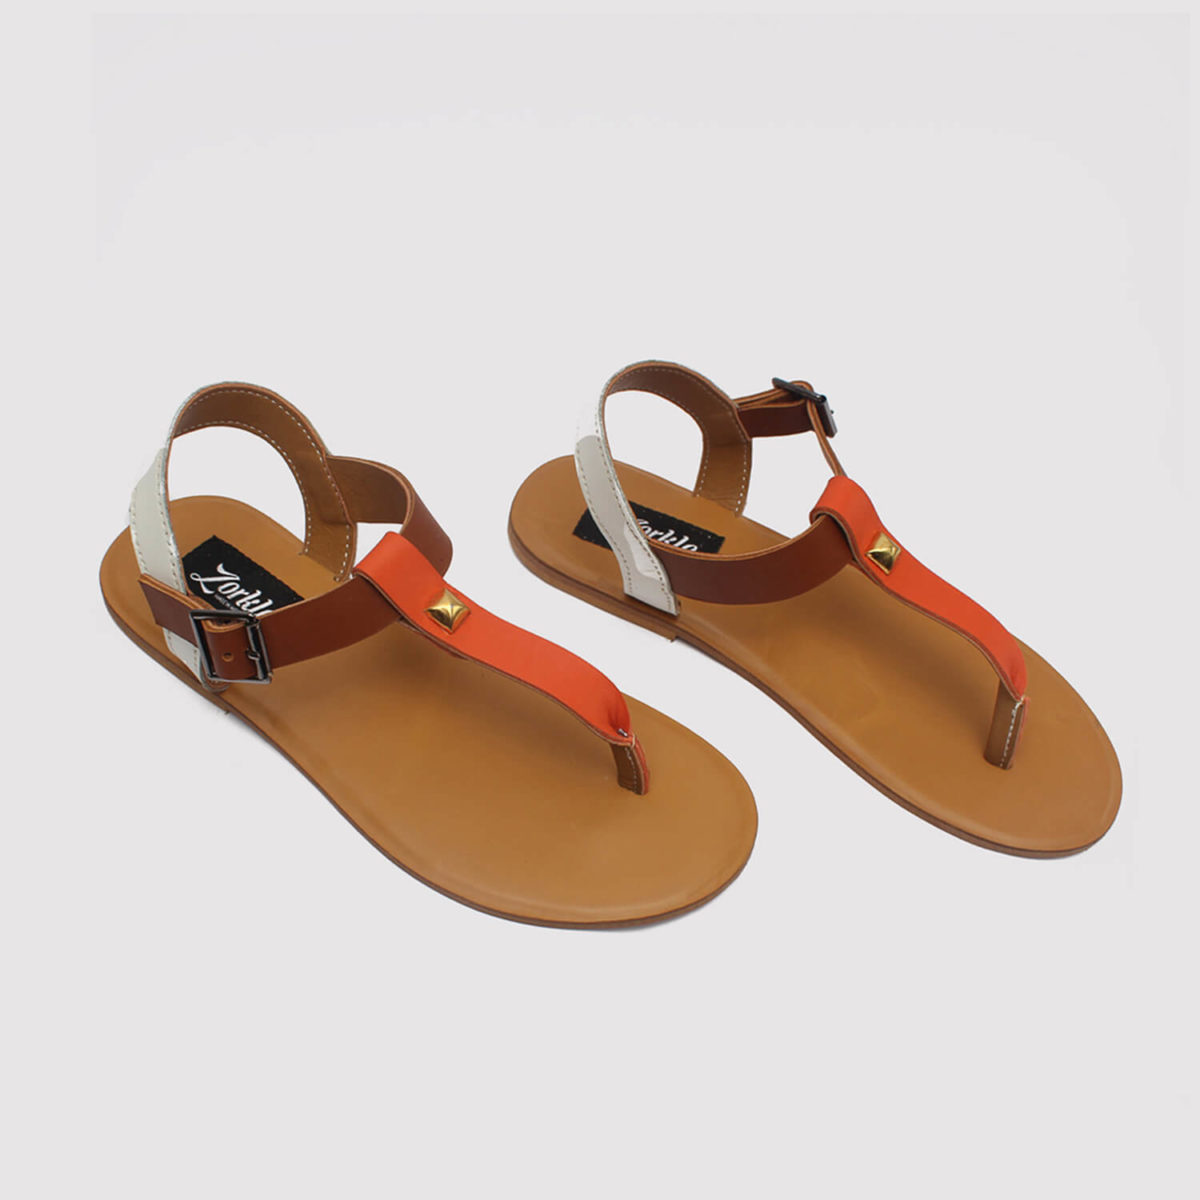 toke sandals orange brown white by zorkle shoes in lagos nigeria